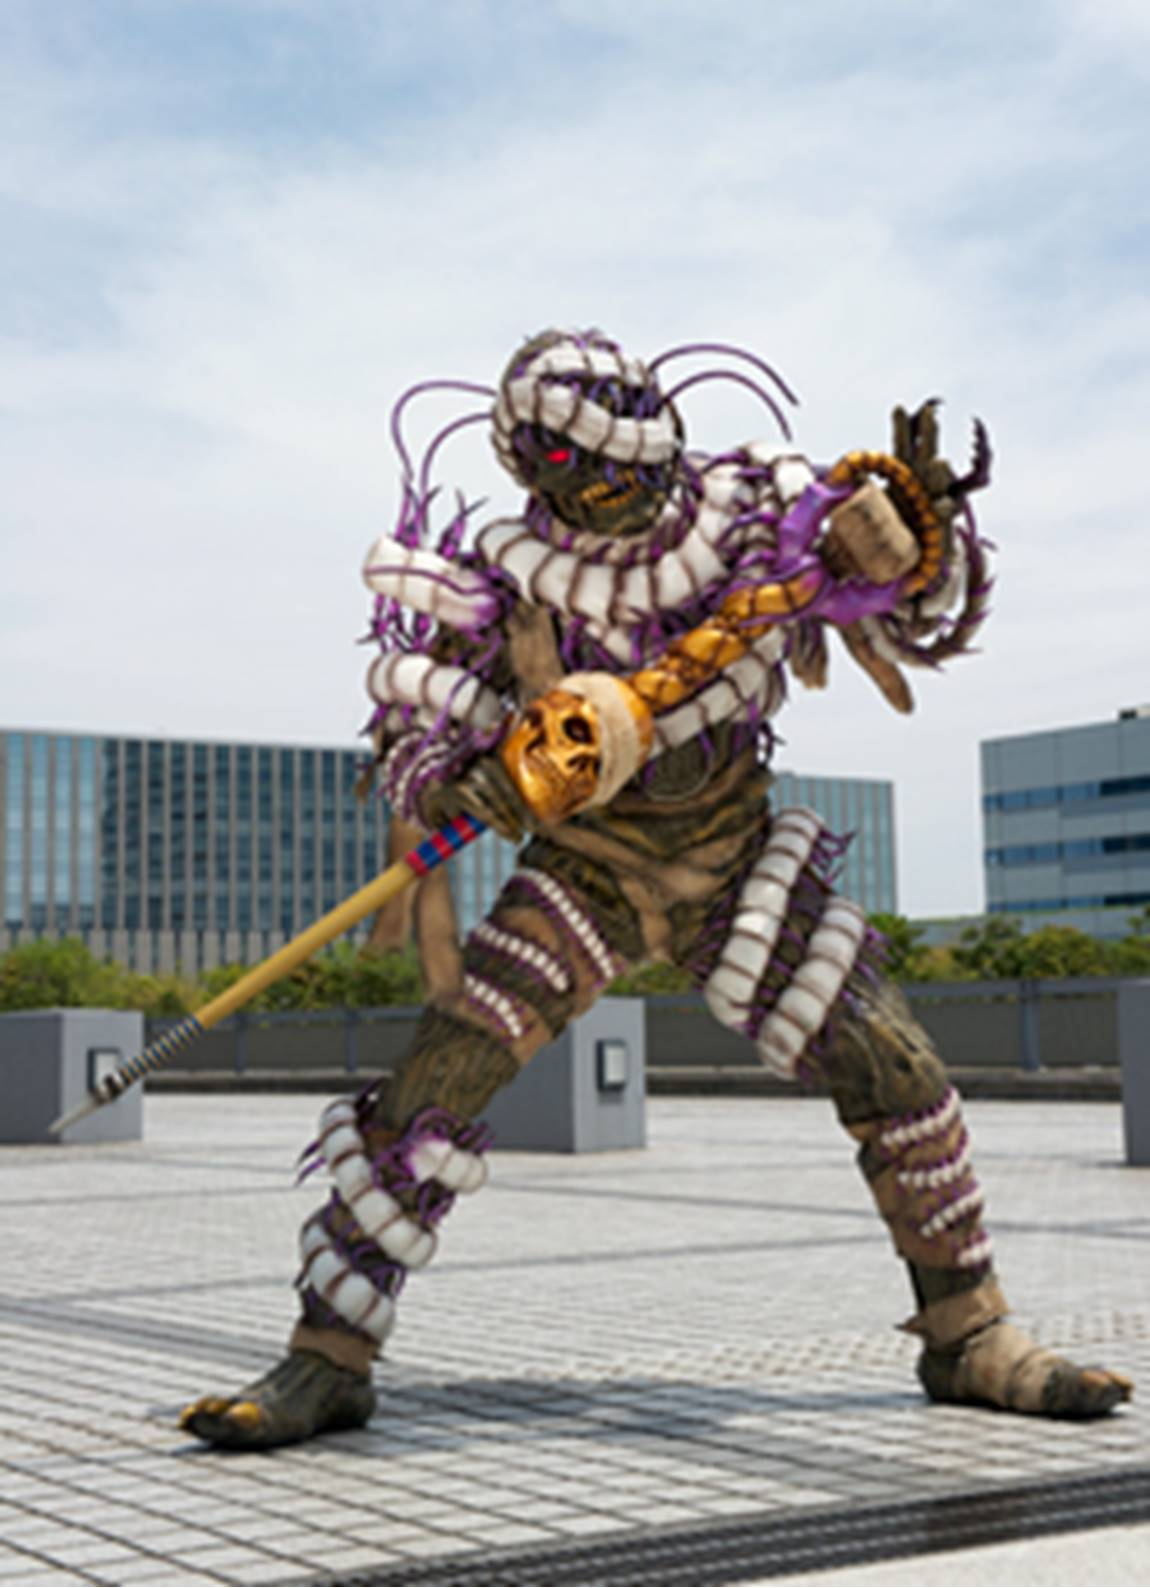 Mummy rangerwiki fandom powered by wikia - Robot power rangers megaforce ...